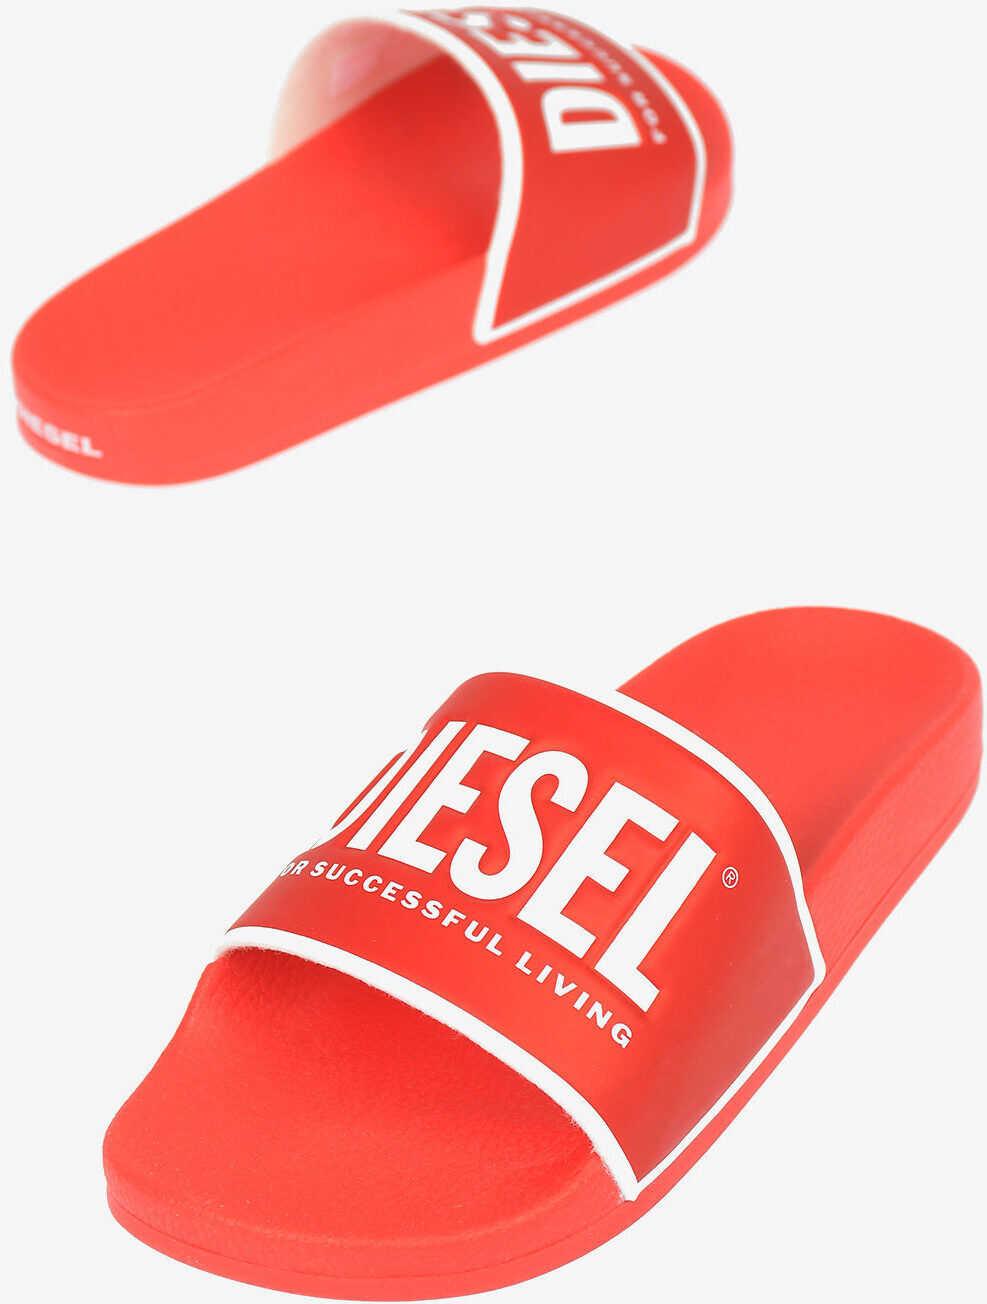 Diesel Rubber SA-VALLA Sandal RED imagine b-mall.ro